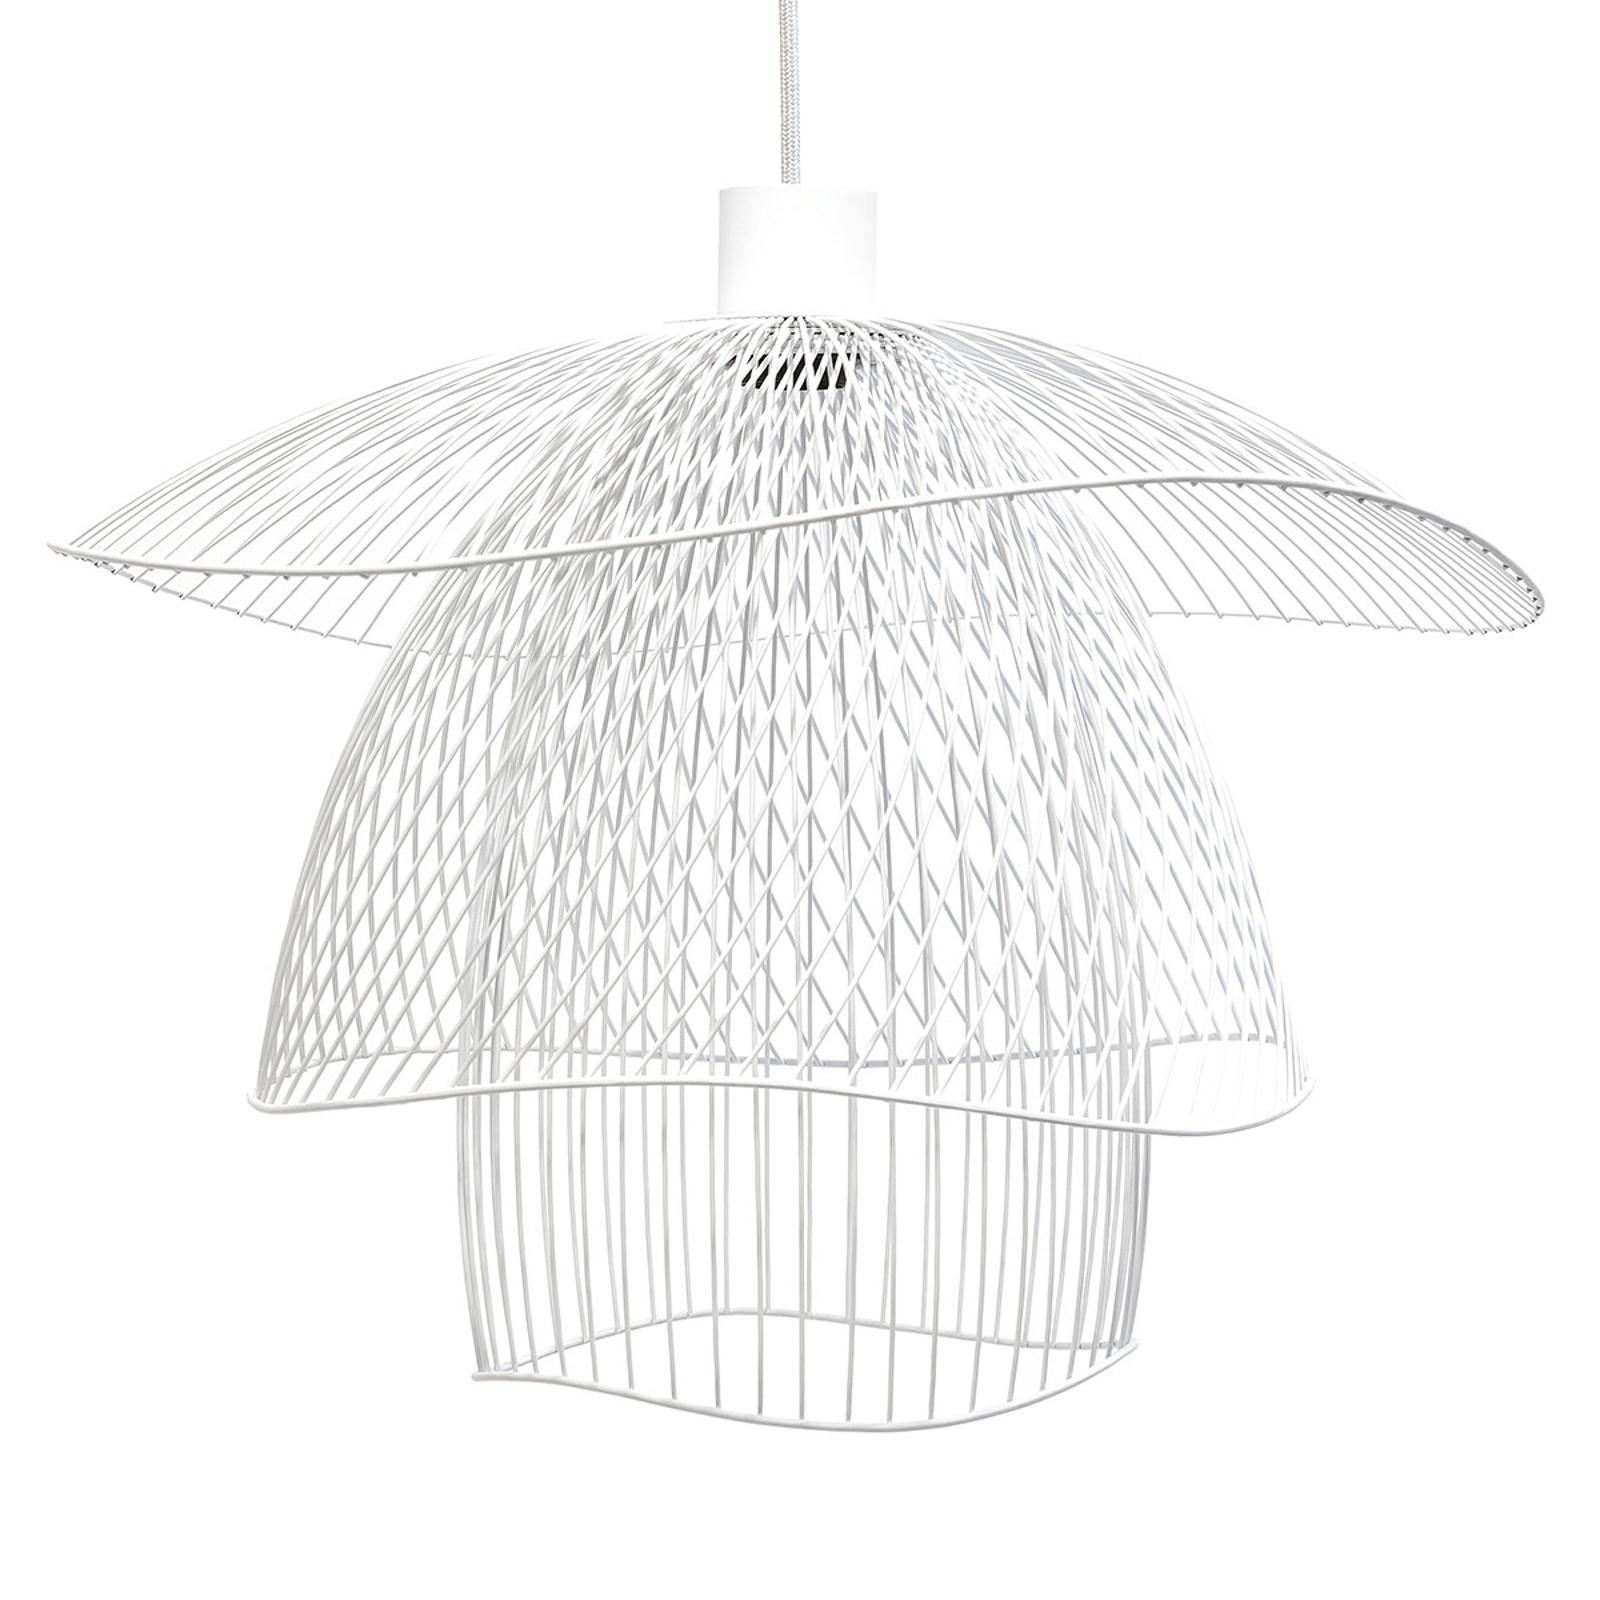 Forestier Papillon S hanglamp 56 cm wit